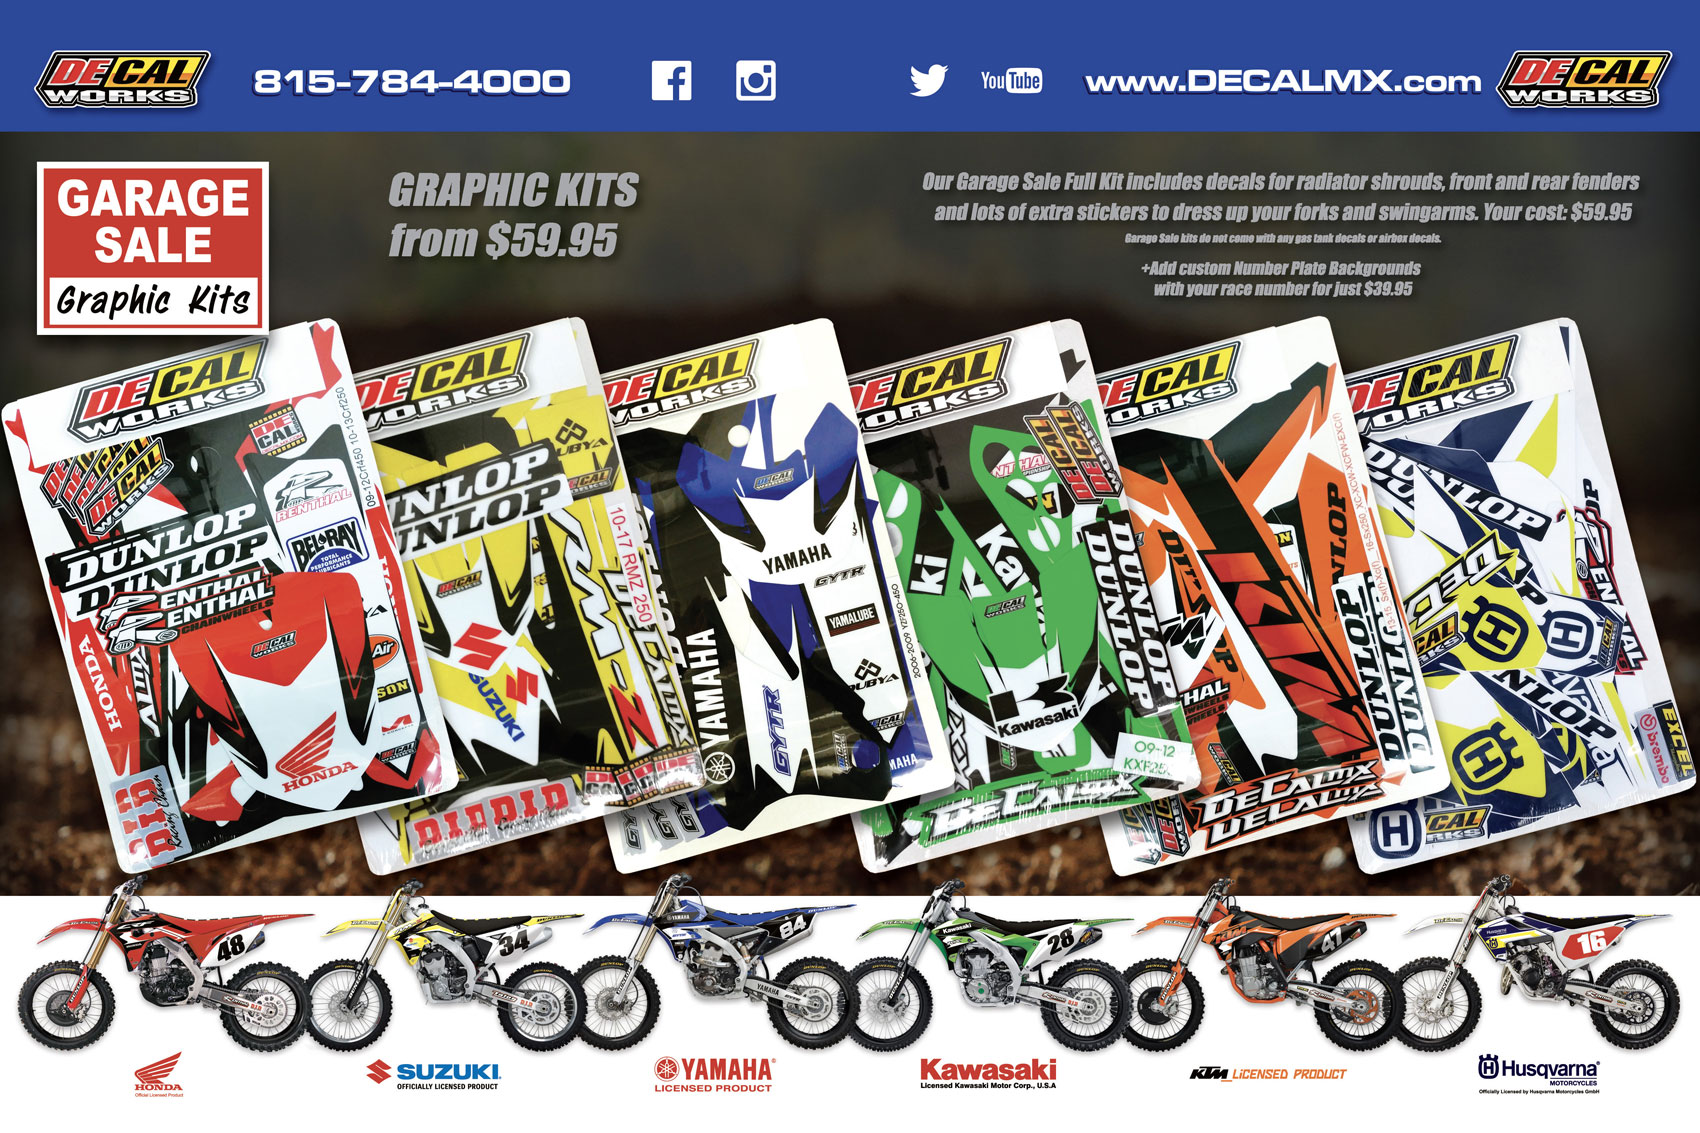 Racer X June 2019 - Decal Works Advertisement